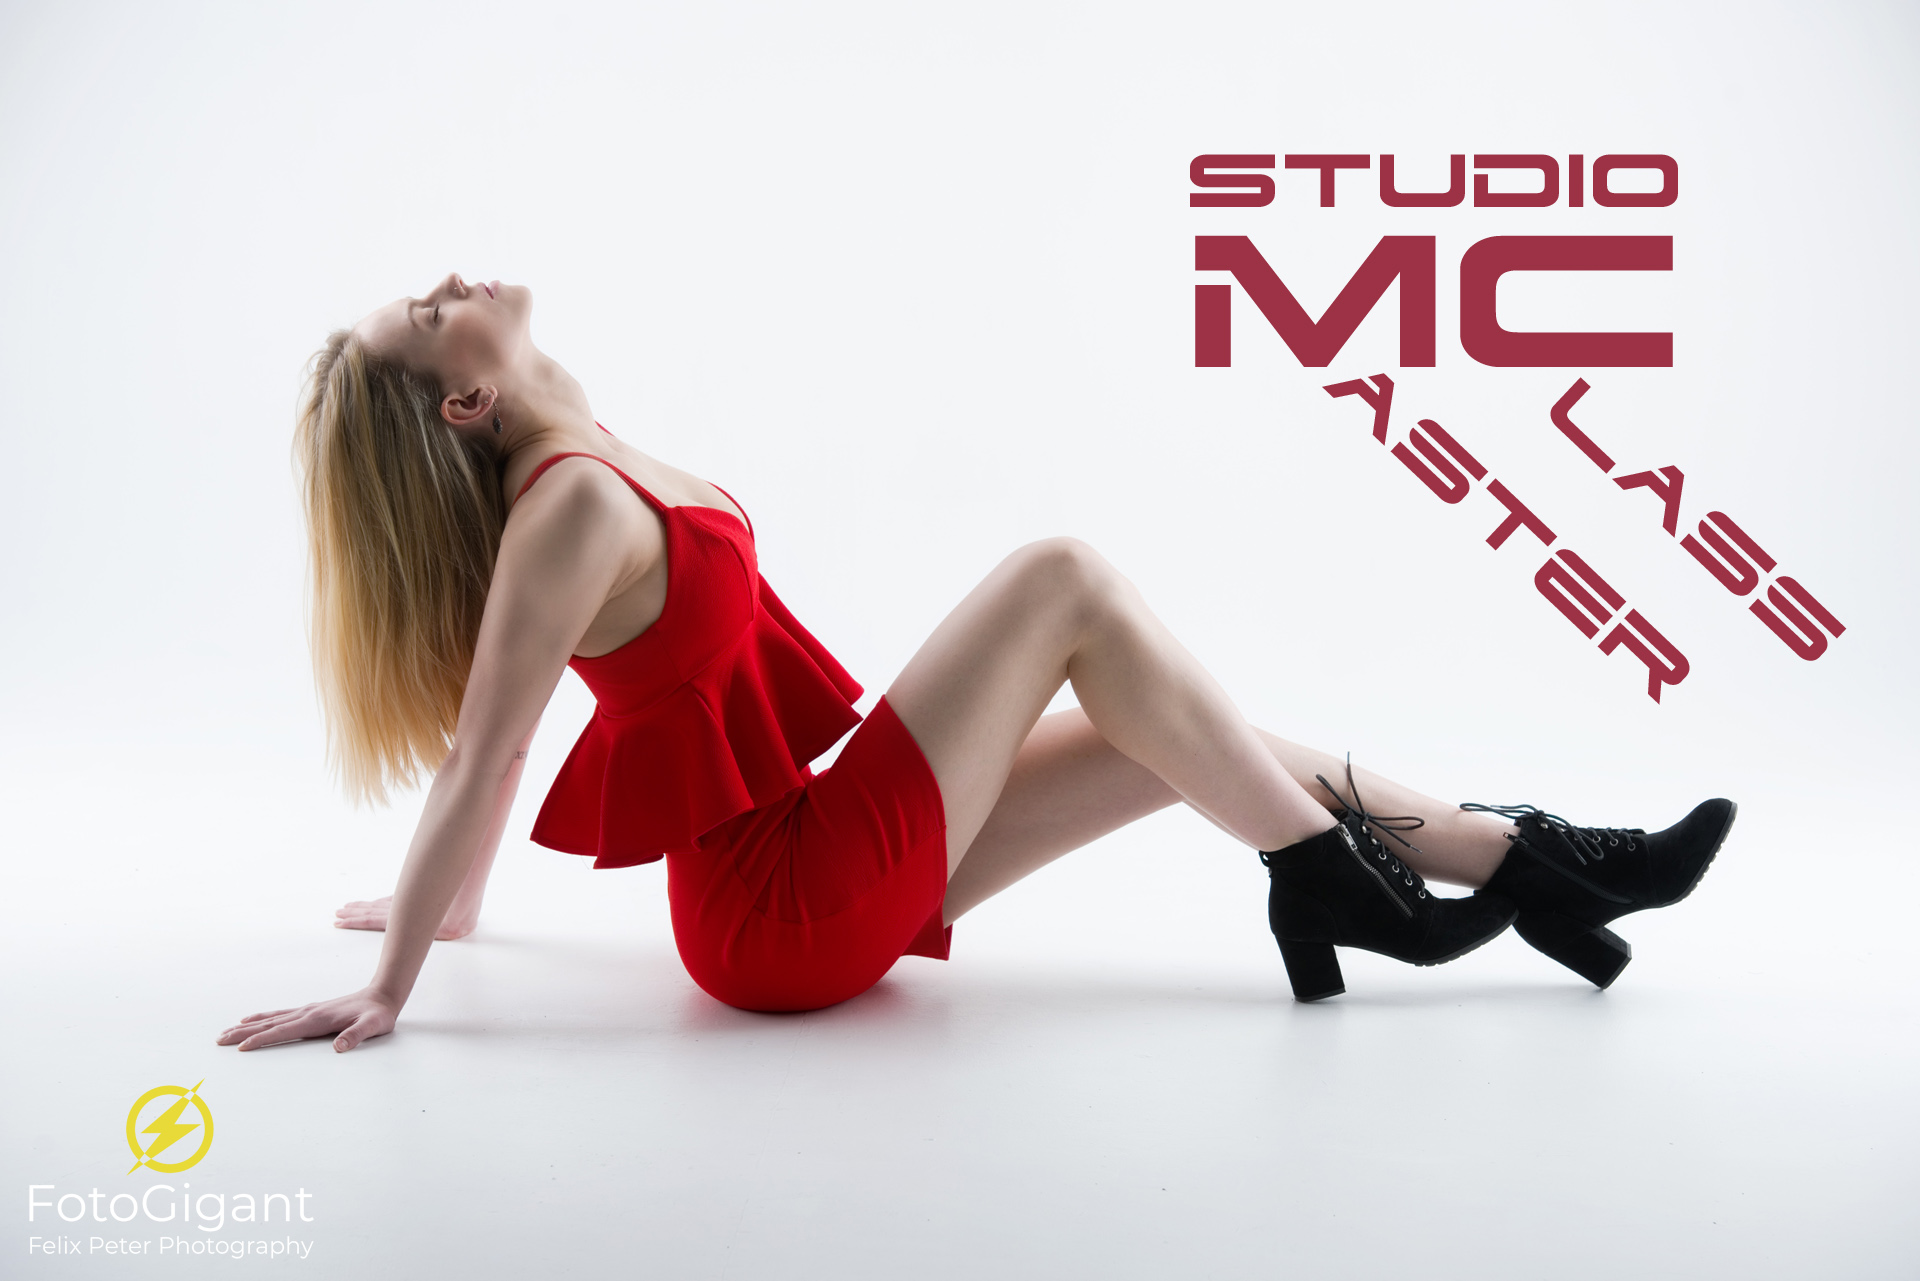 FotoGigant_StudioFlash-Masterclass_Workshop_00.jpg